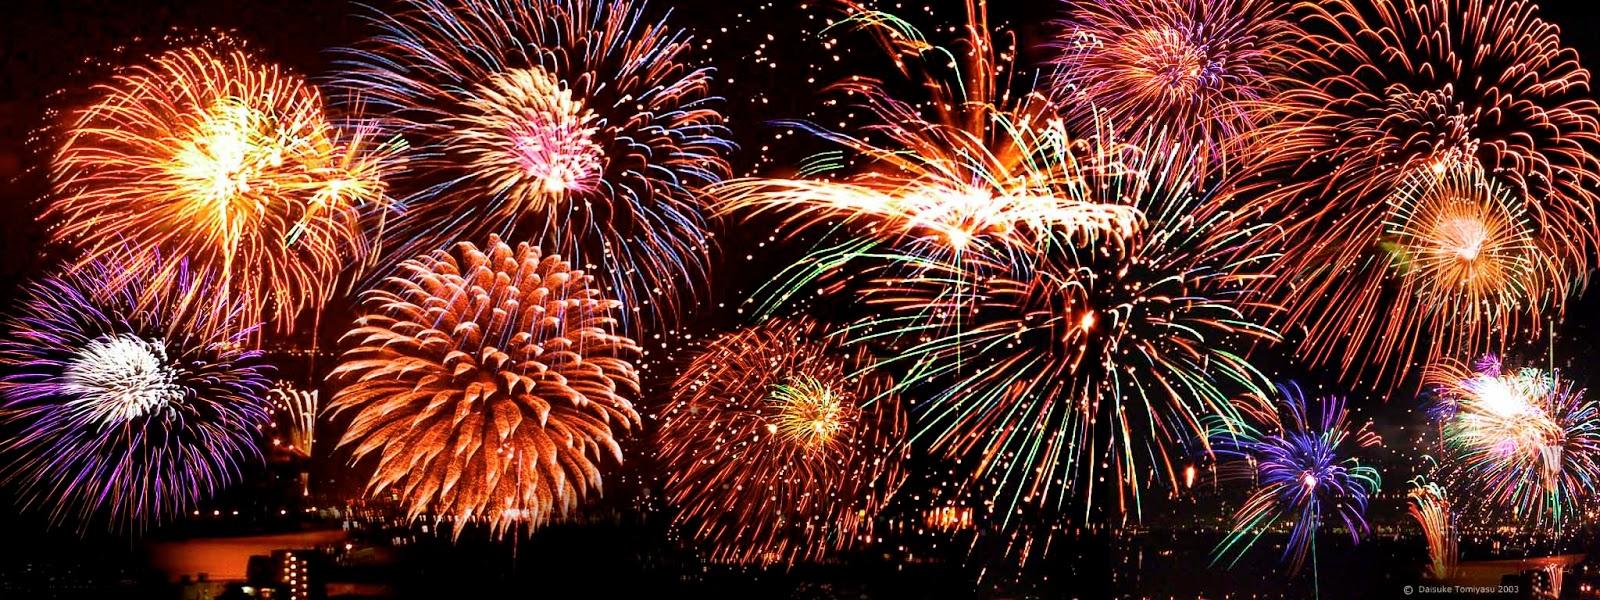 Gambar kumpulan gambar kembang api 2016 happy year wallpaper hd kumpulan gambar kembang api 2016 happy year wallpaper hd fireworks voltagebd Images